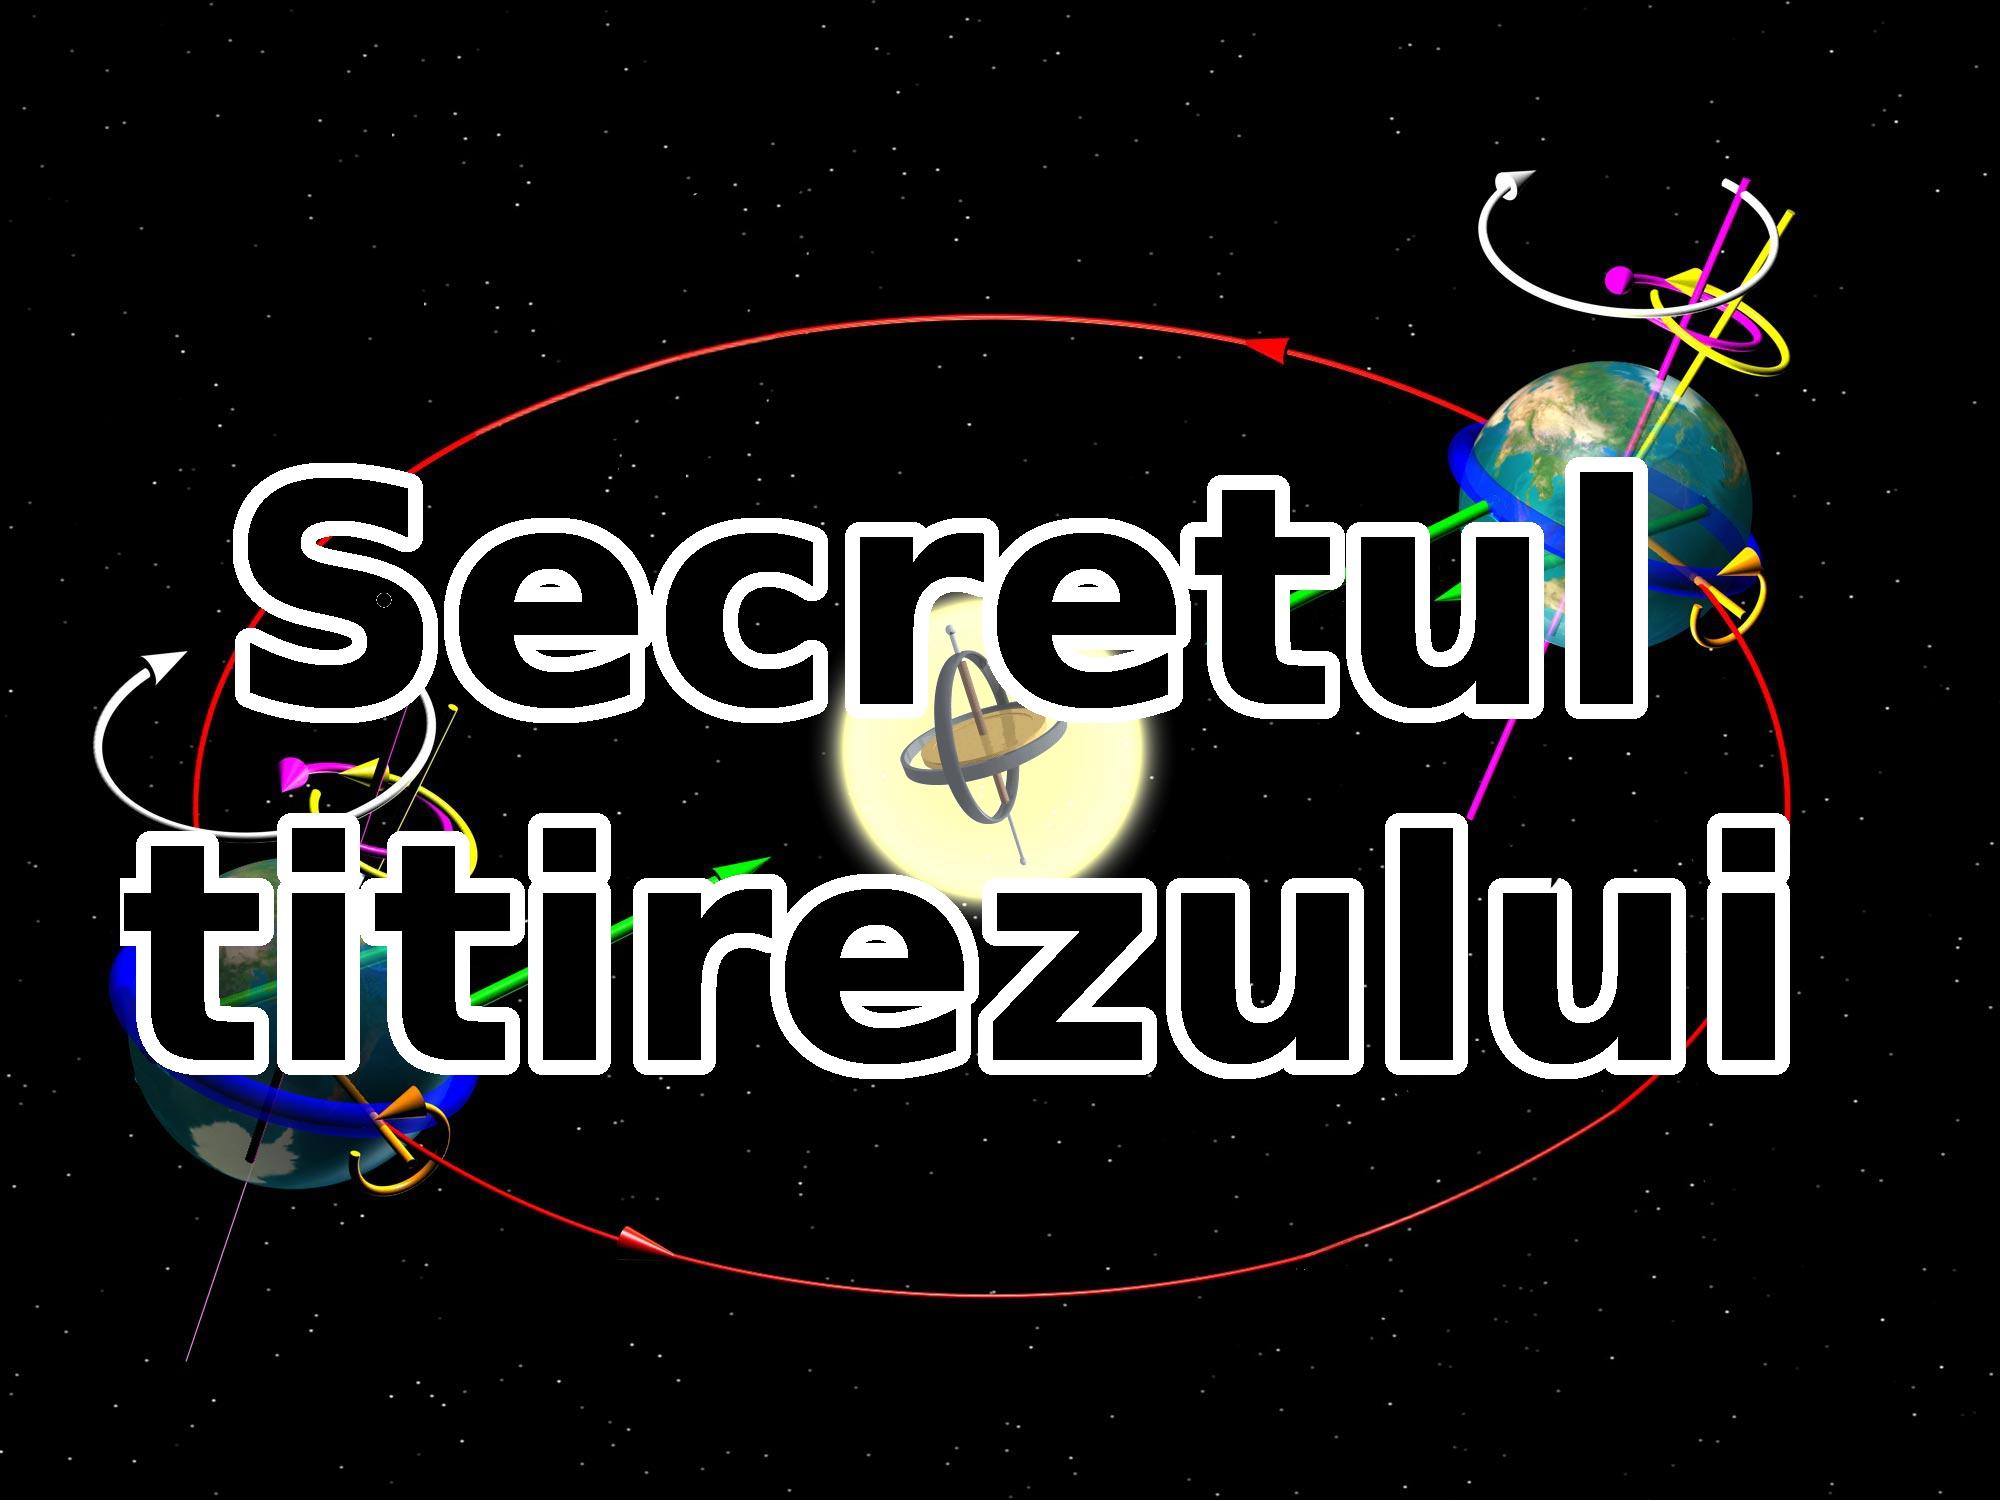 secretul-titirezului-thumb